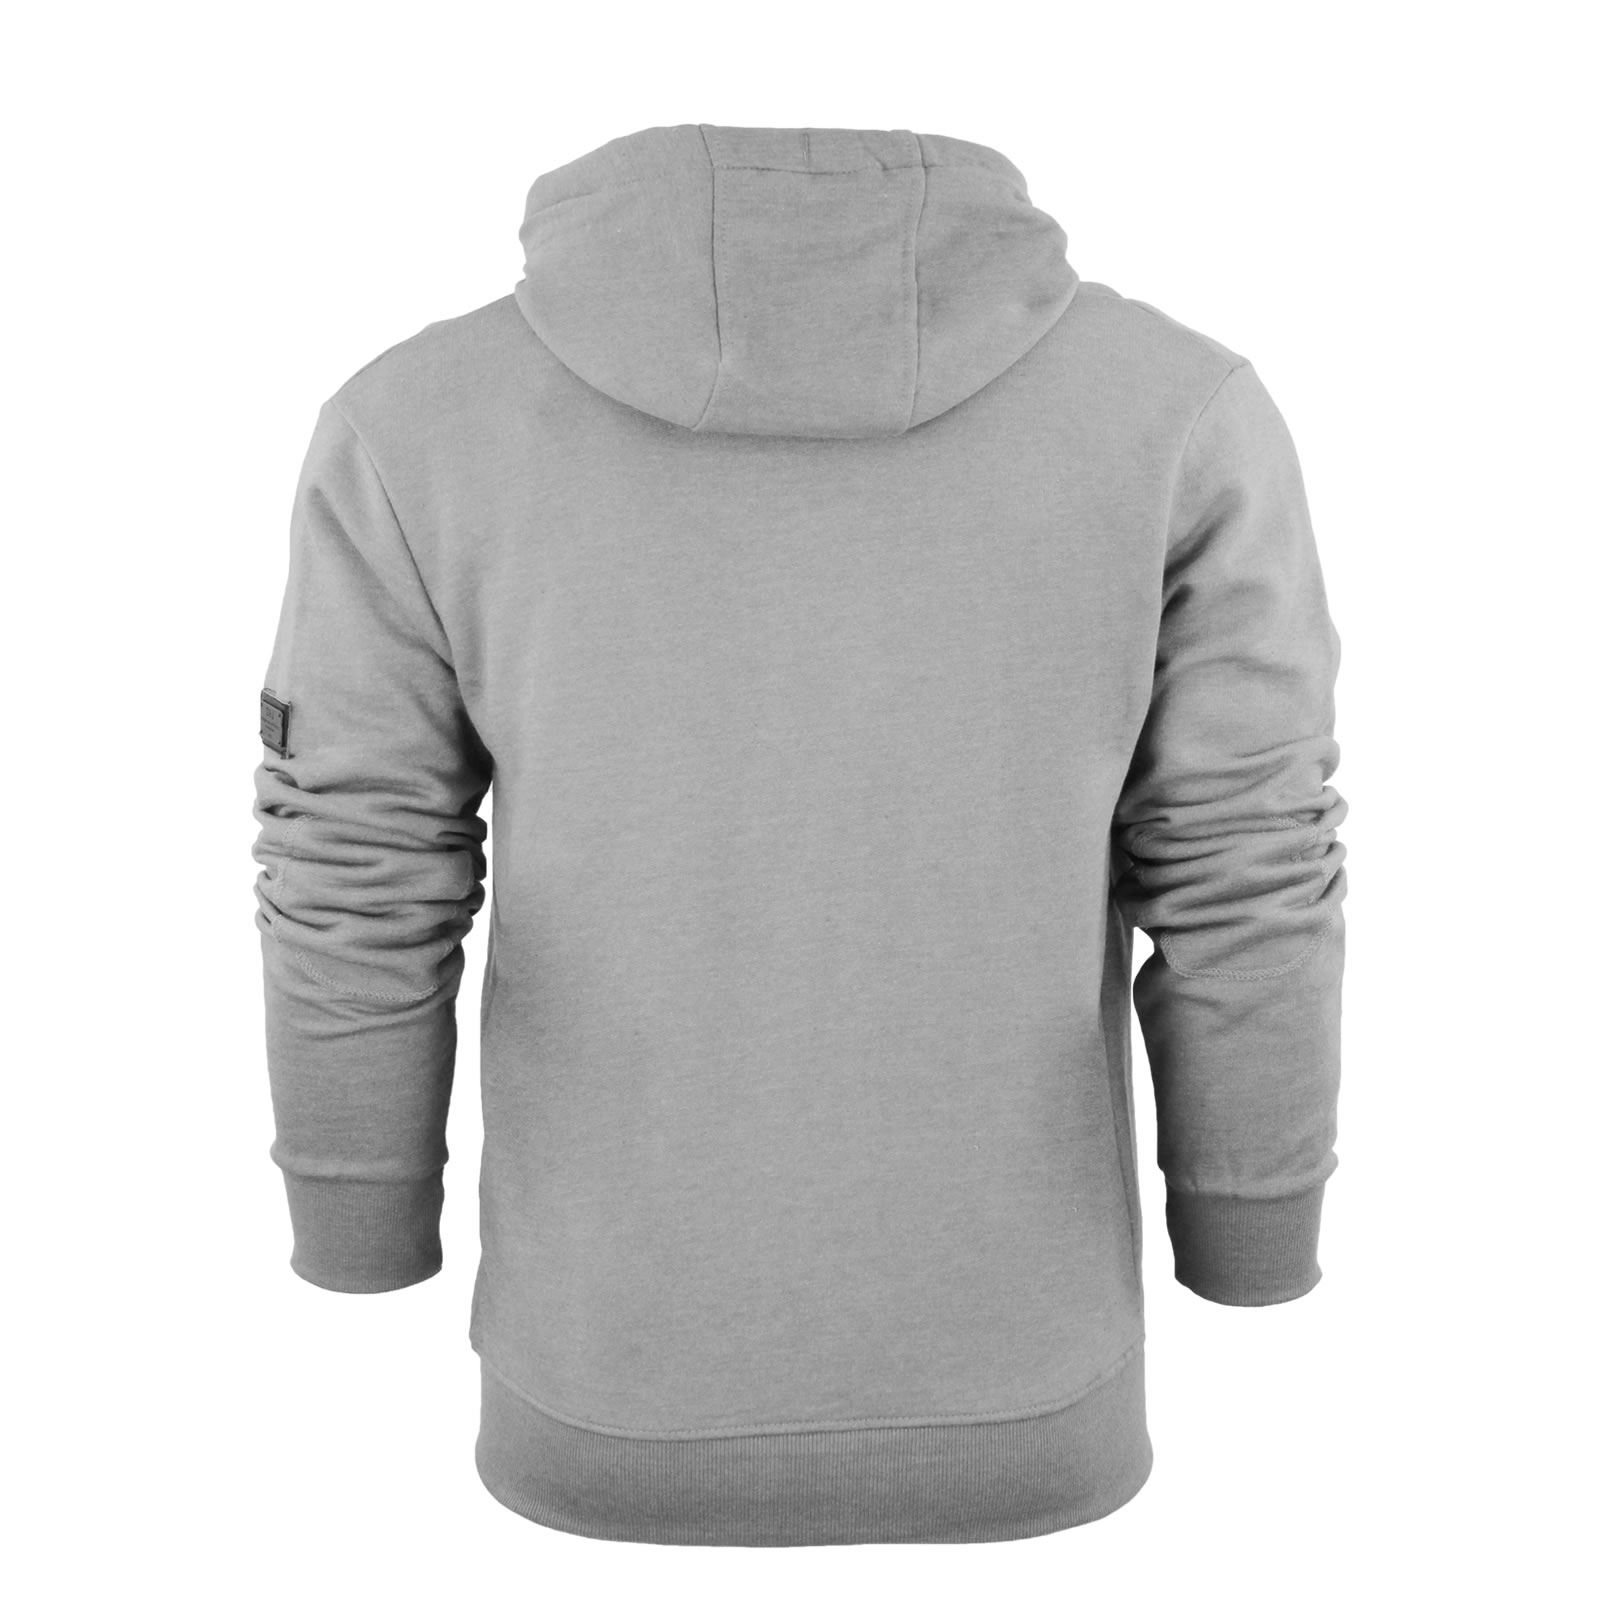 Mens-Hoodie-Smith-amp-Jones-Zip-Up-Hooded-Sweater-Jumper thumbnail 27